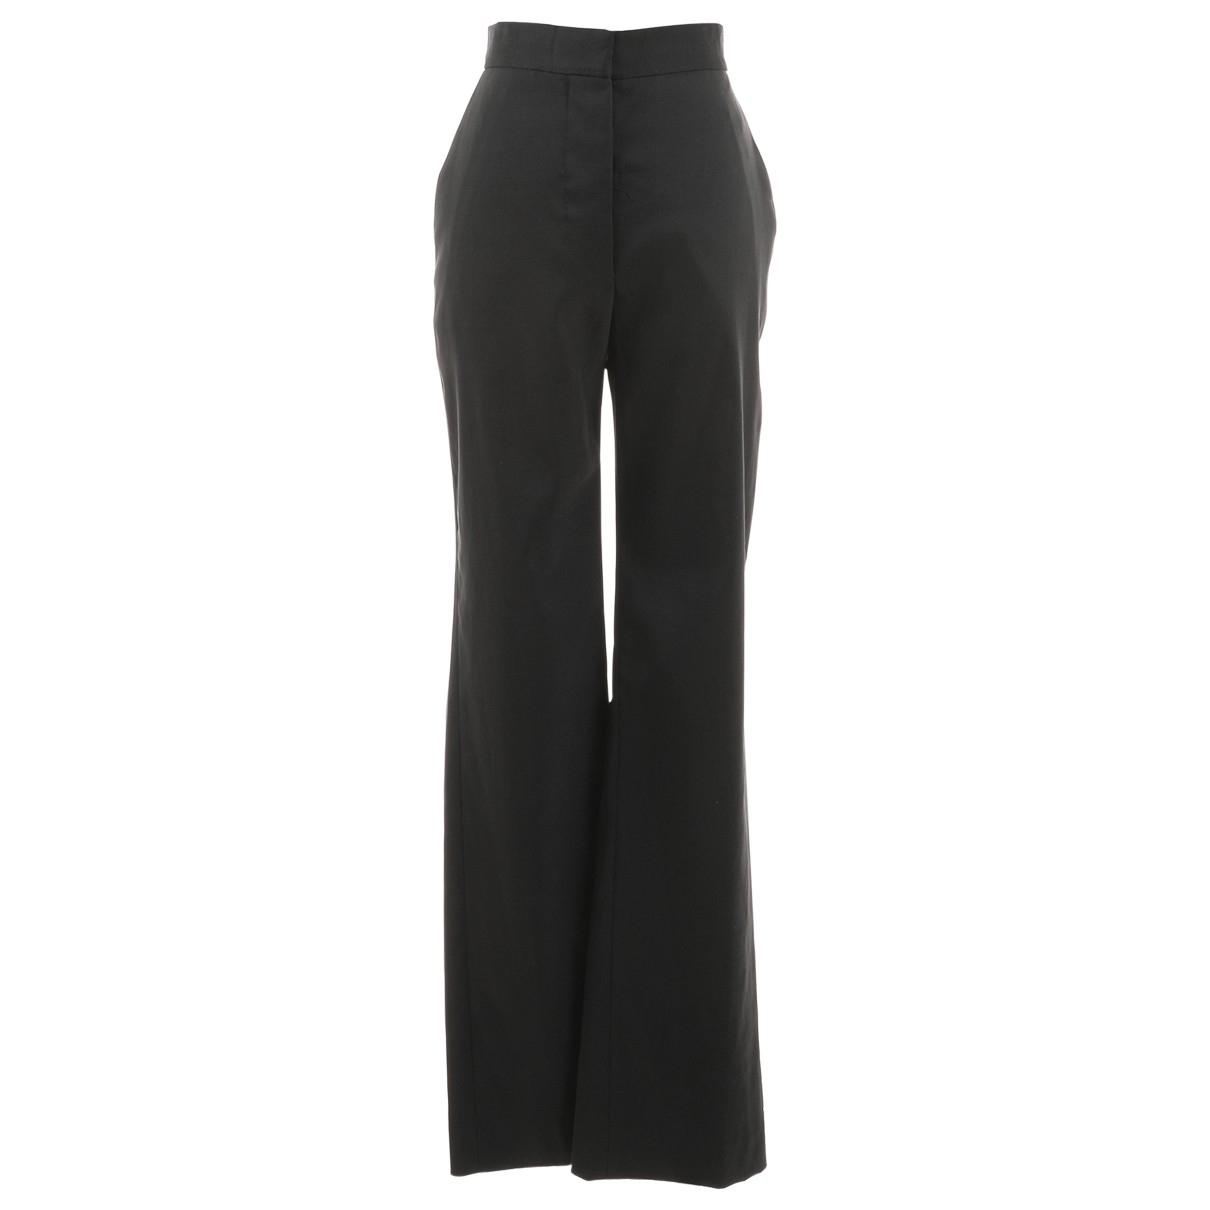 Stella Mccartney - Pantalon   pour femme en soie - noir